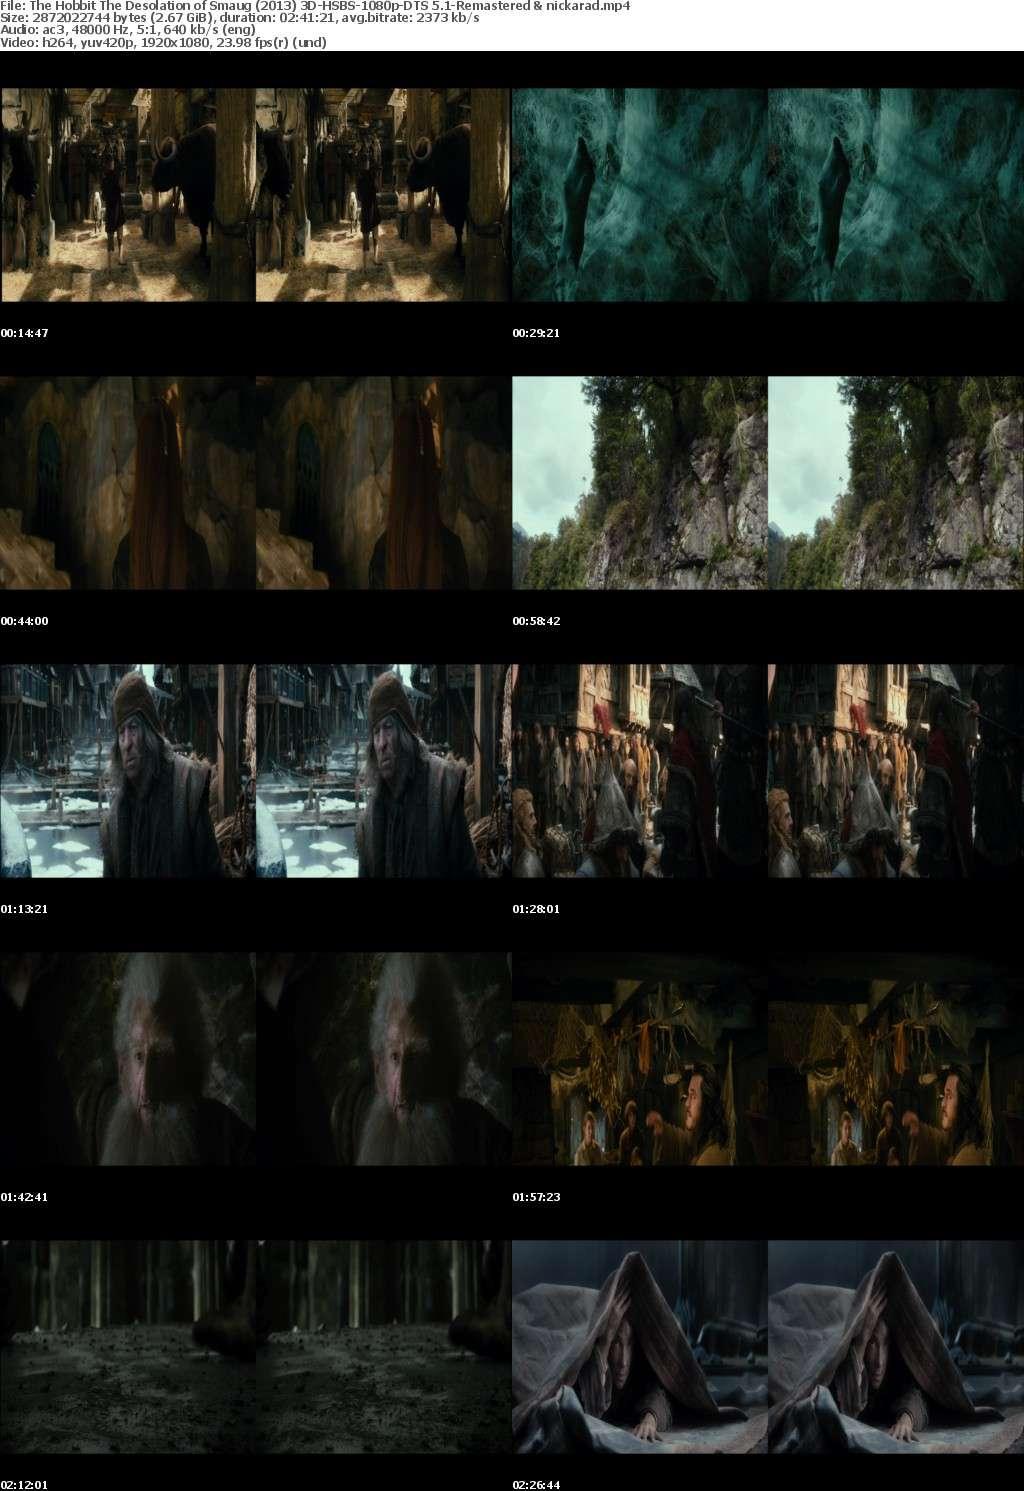 The Hobbit The Desolation of Smaug (2013) 3D HSBS 1080p BluRay AC3 Remastered-nickarad